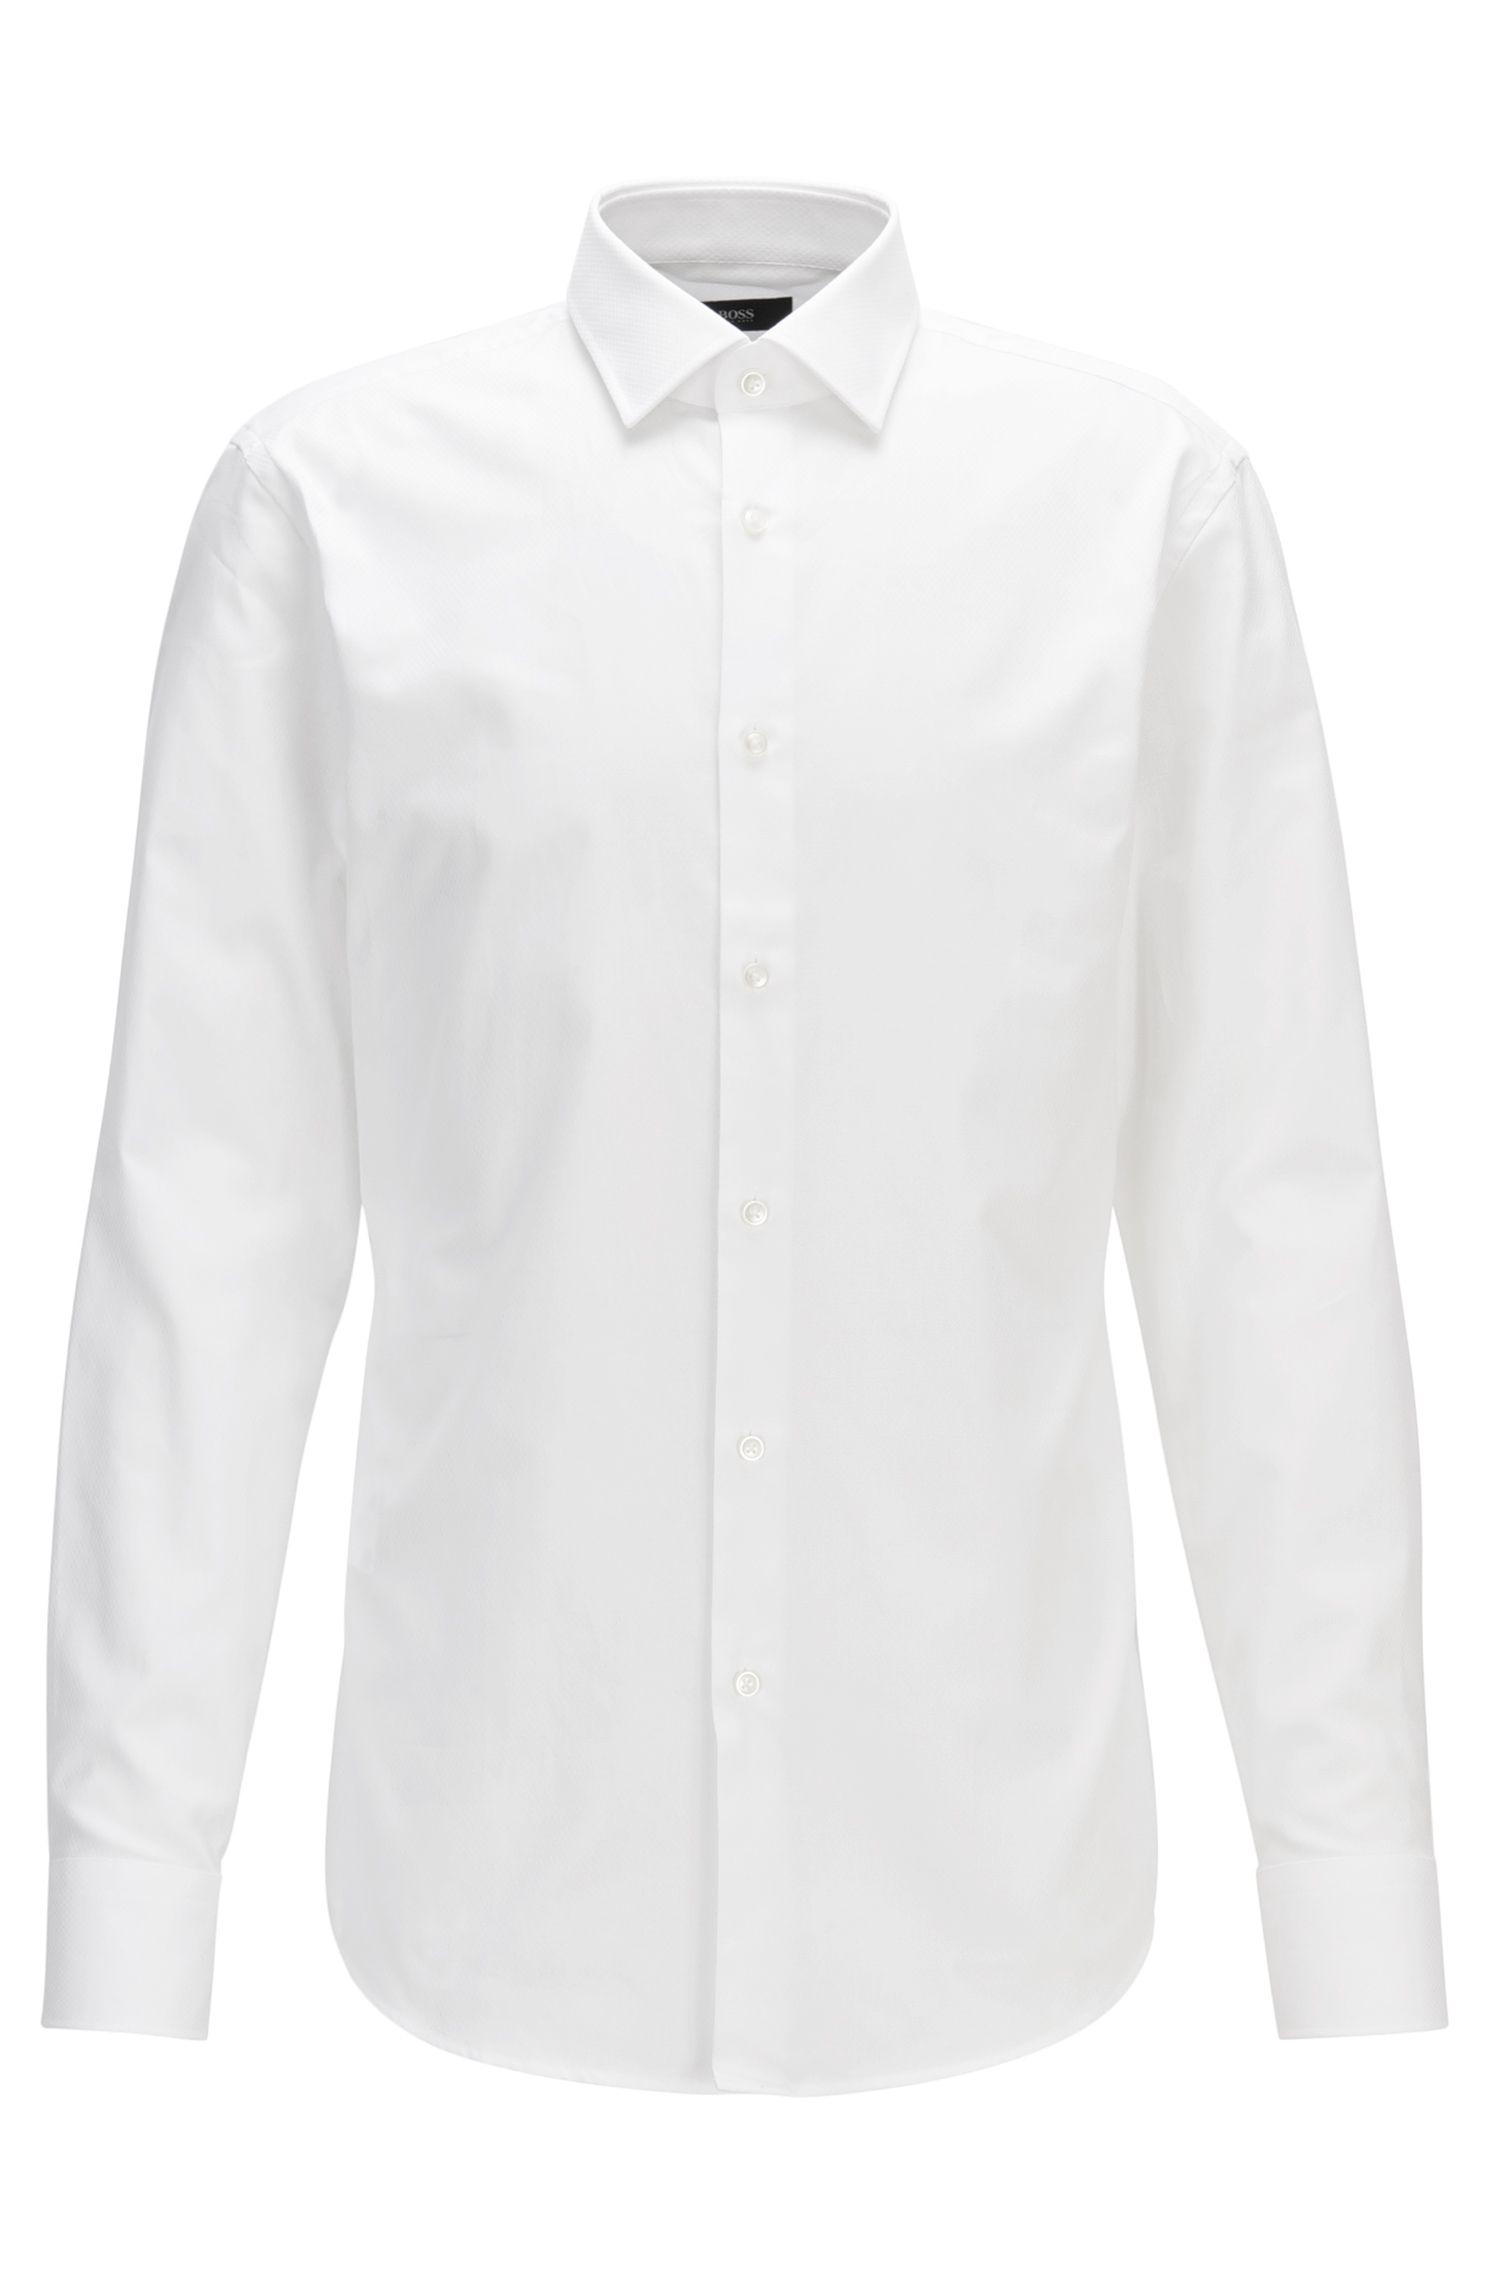 Cotton Dress Shirt, Slim Fit | Jenno, White